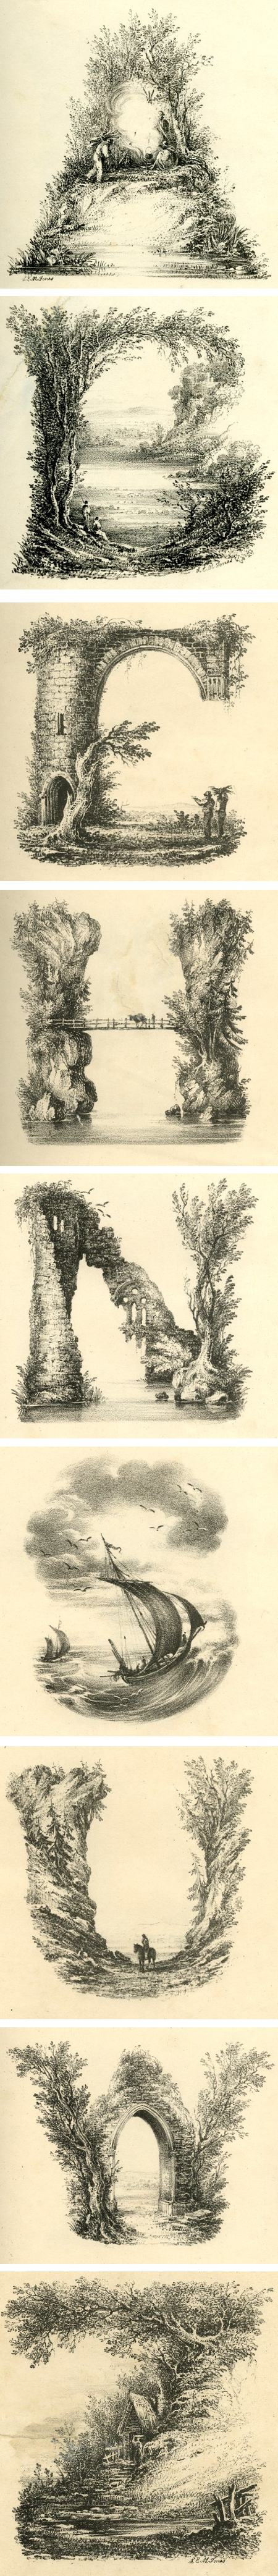 Landscape alphabet, L.E.M. Jones, printed by Charles Joseph Hullmandel